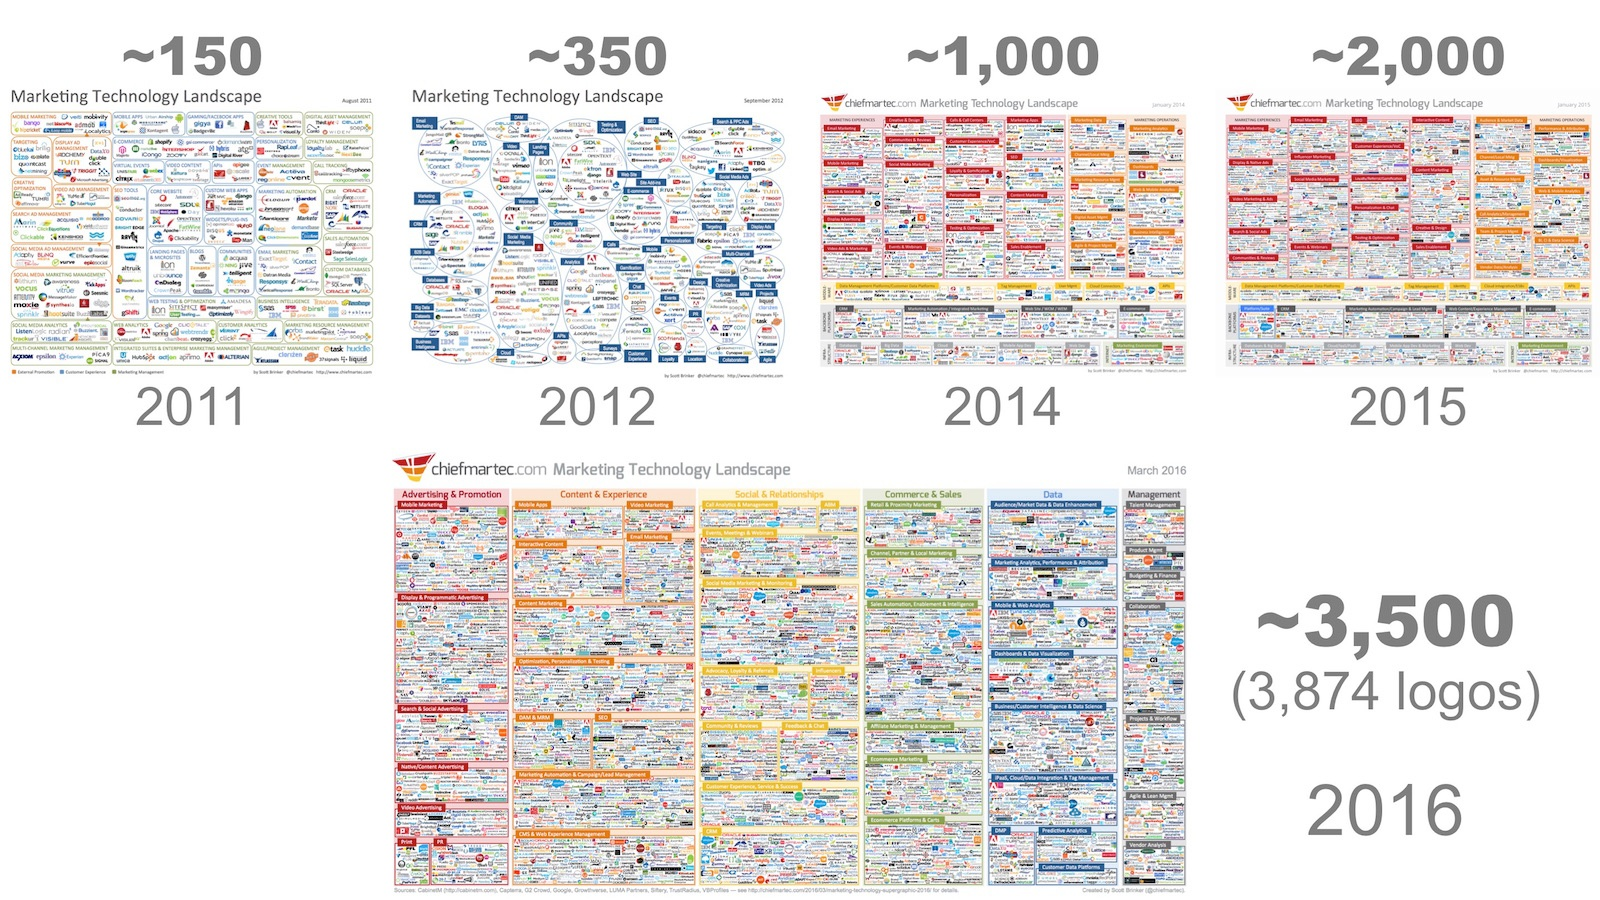 marketing_tech_landscape_timeline_2016.jpg